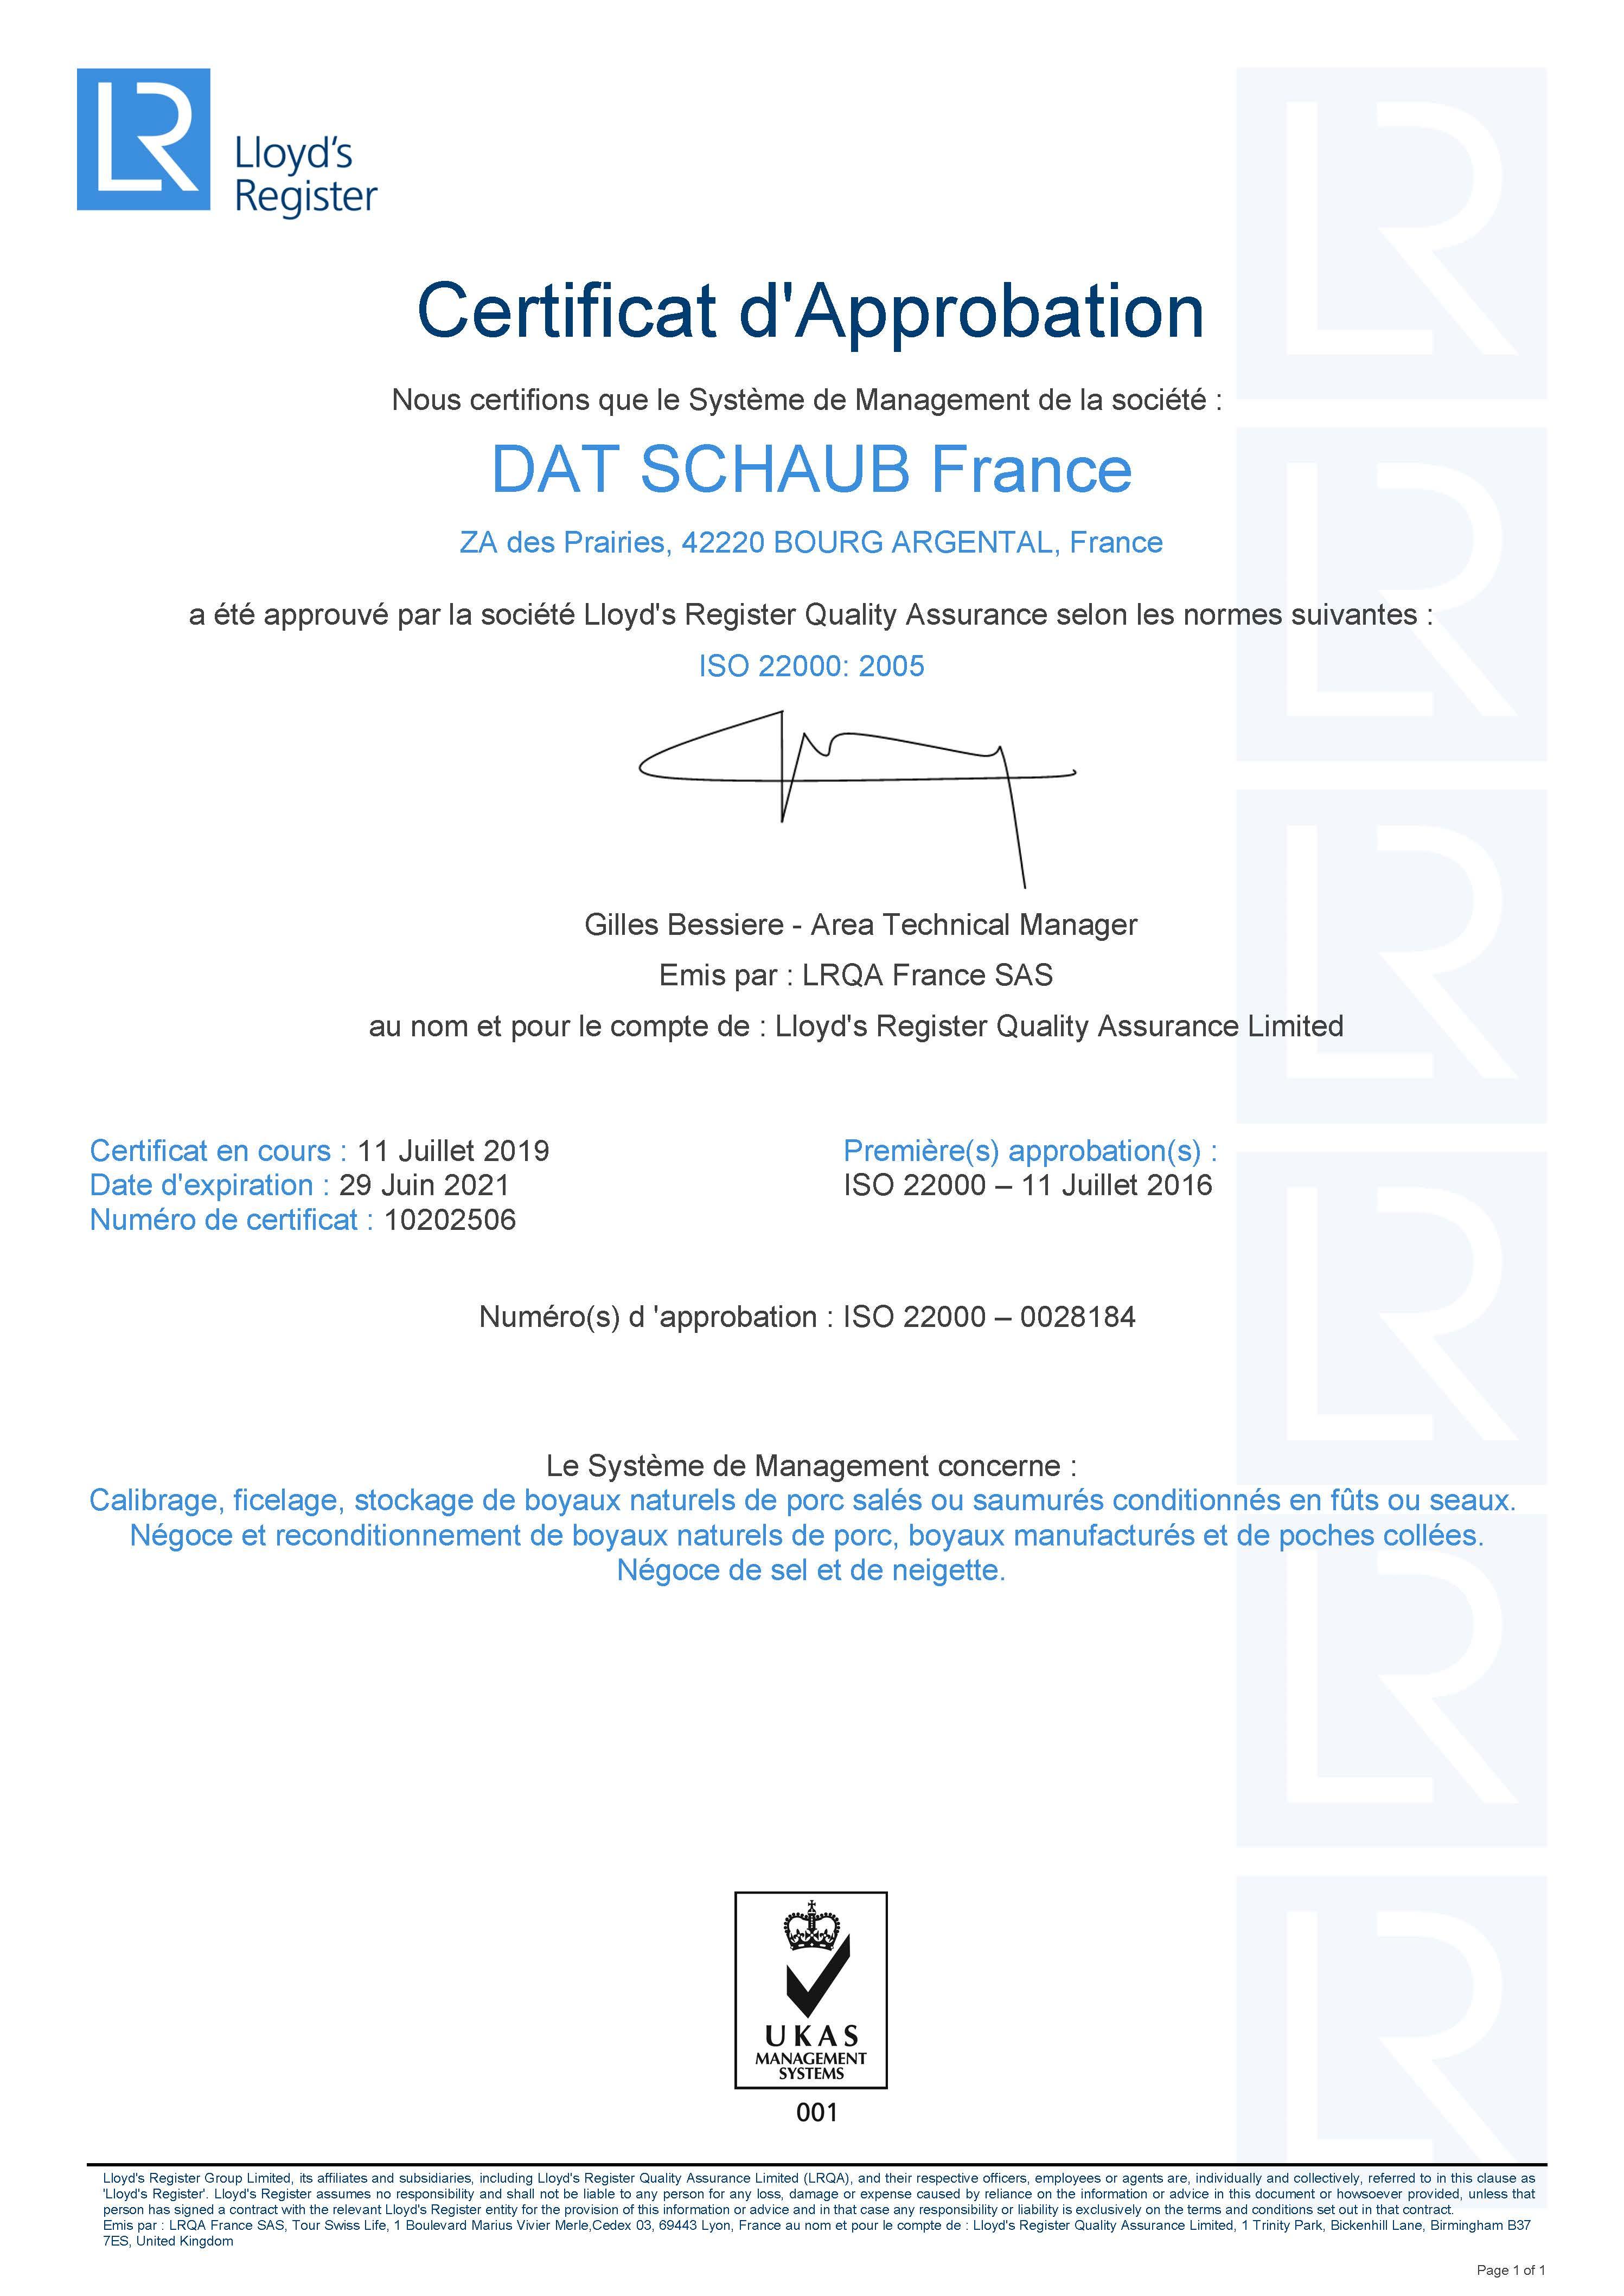 Certificat ISO 22000 - Bourg Argental 2019-2021